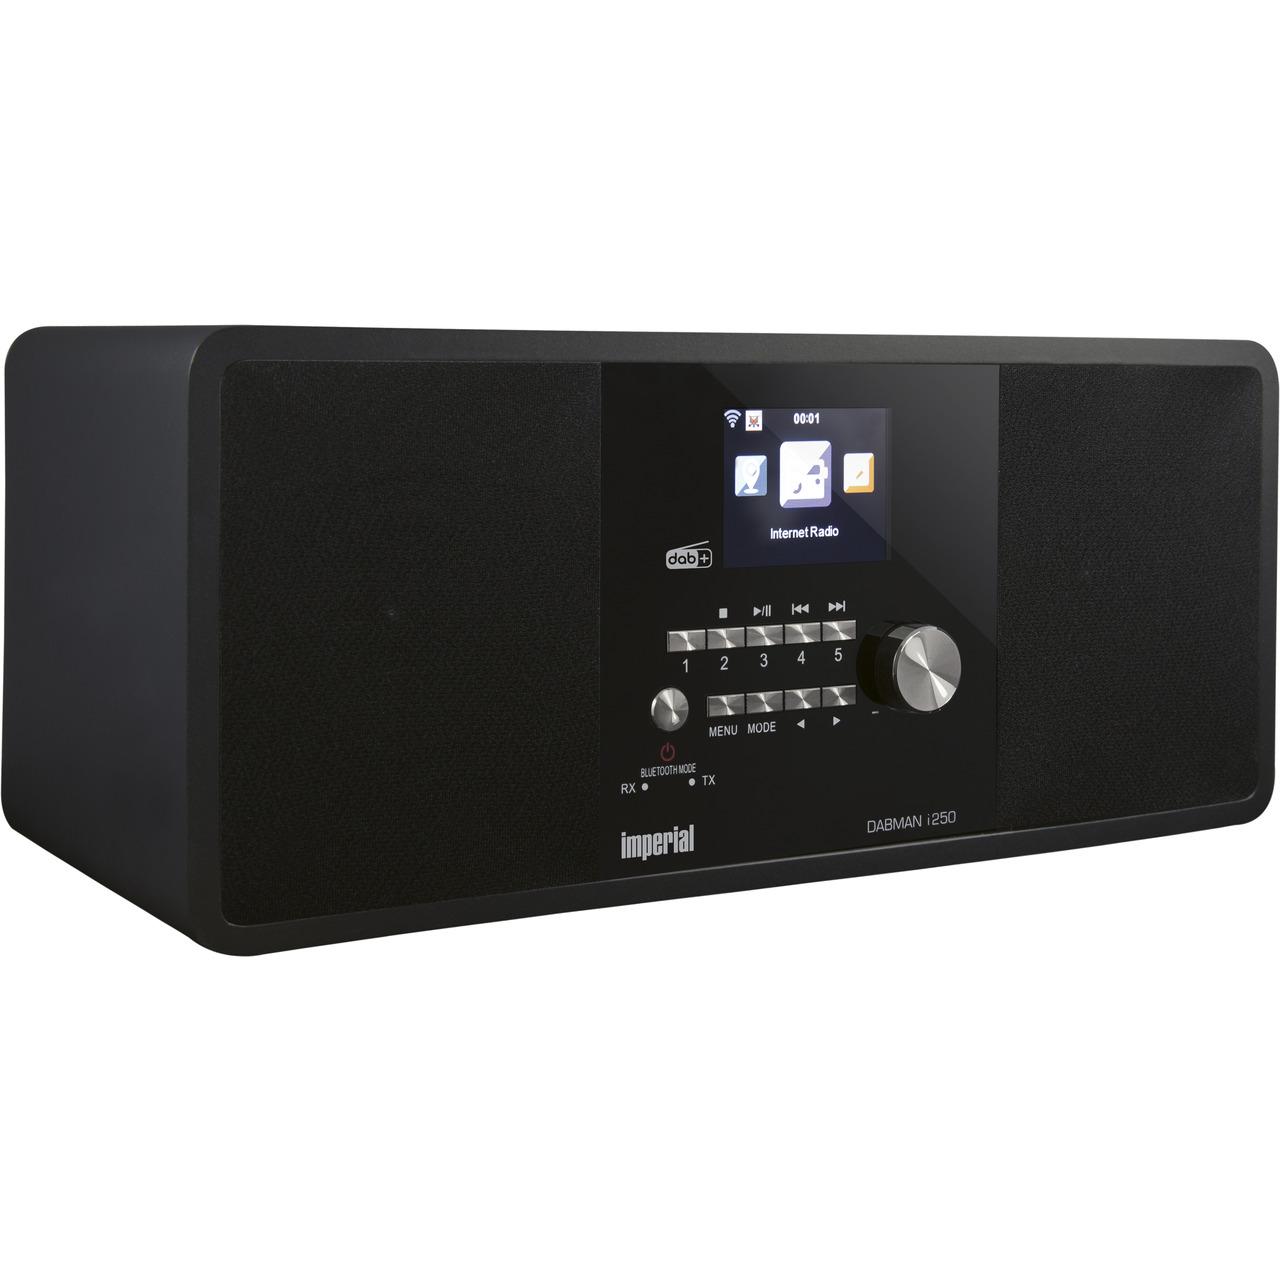 Imperial Hybridradio DABMAN i250- UKW/DAB+/Internetradio- Bluetooth-Sender/-Empfänger- 20-W-RMS